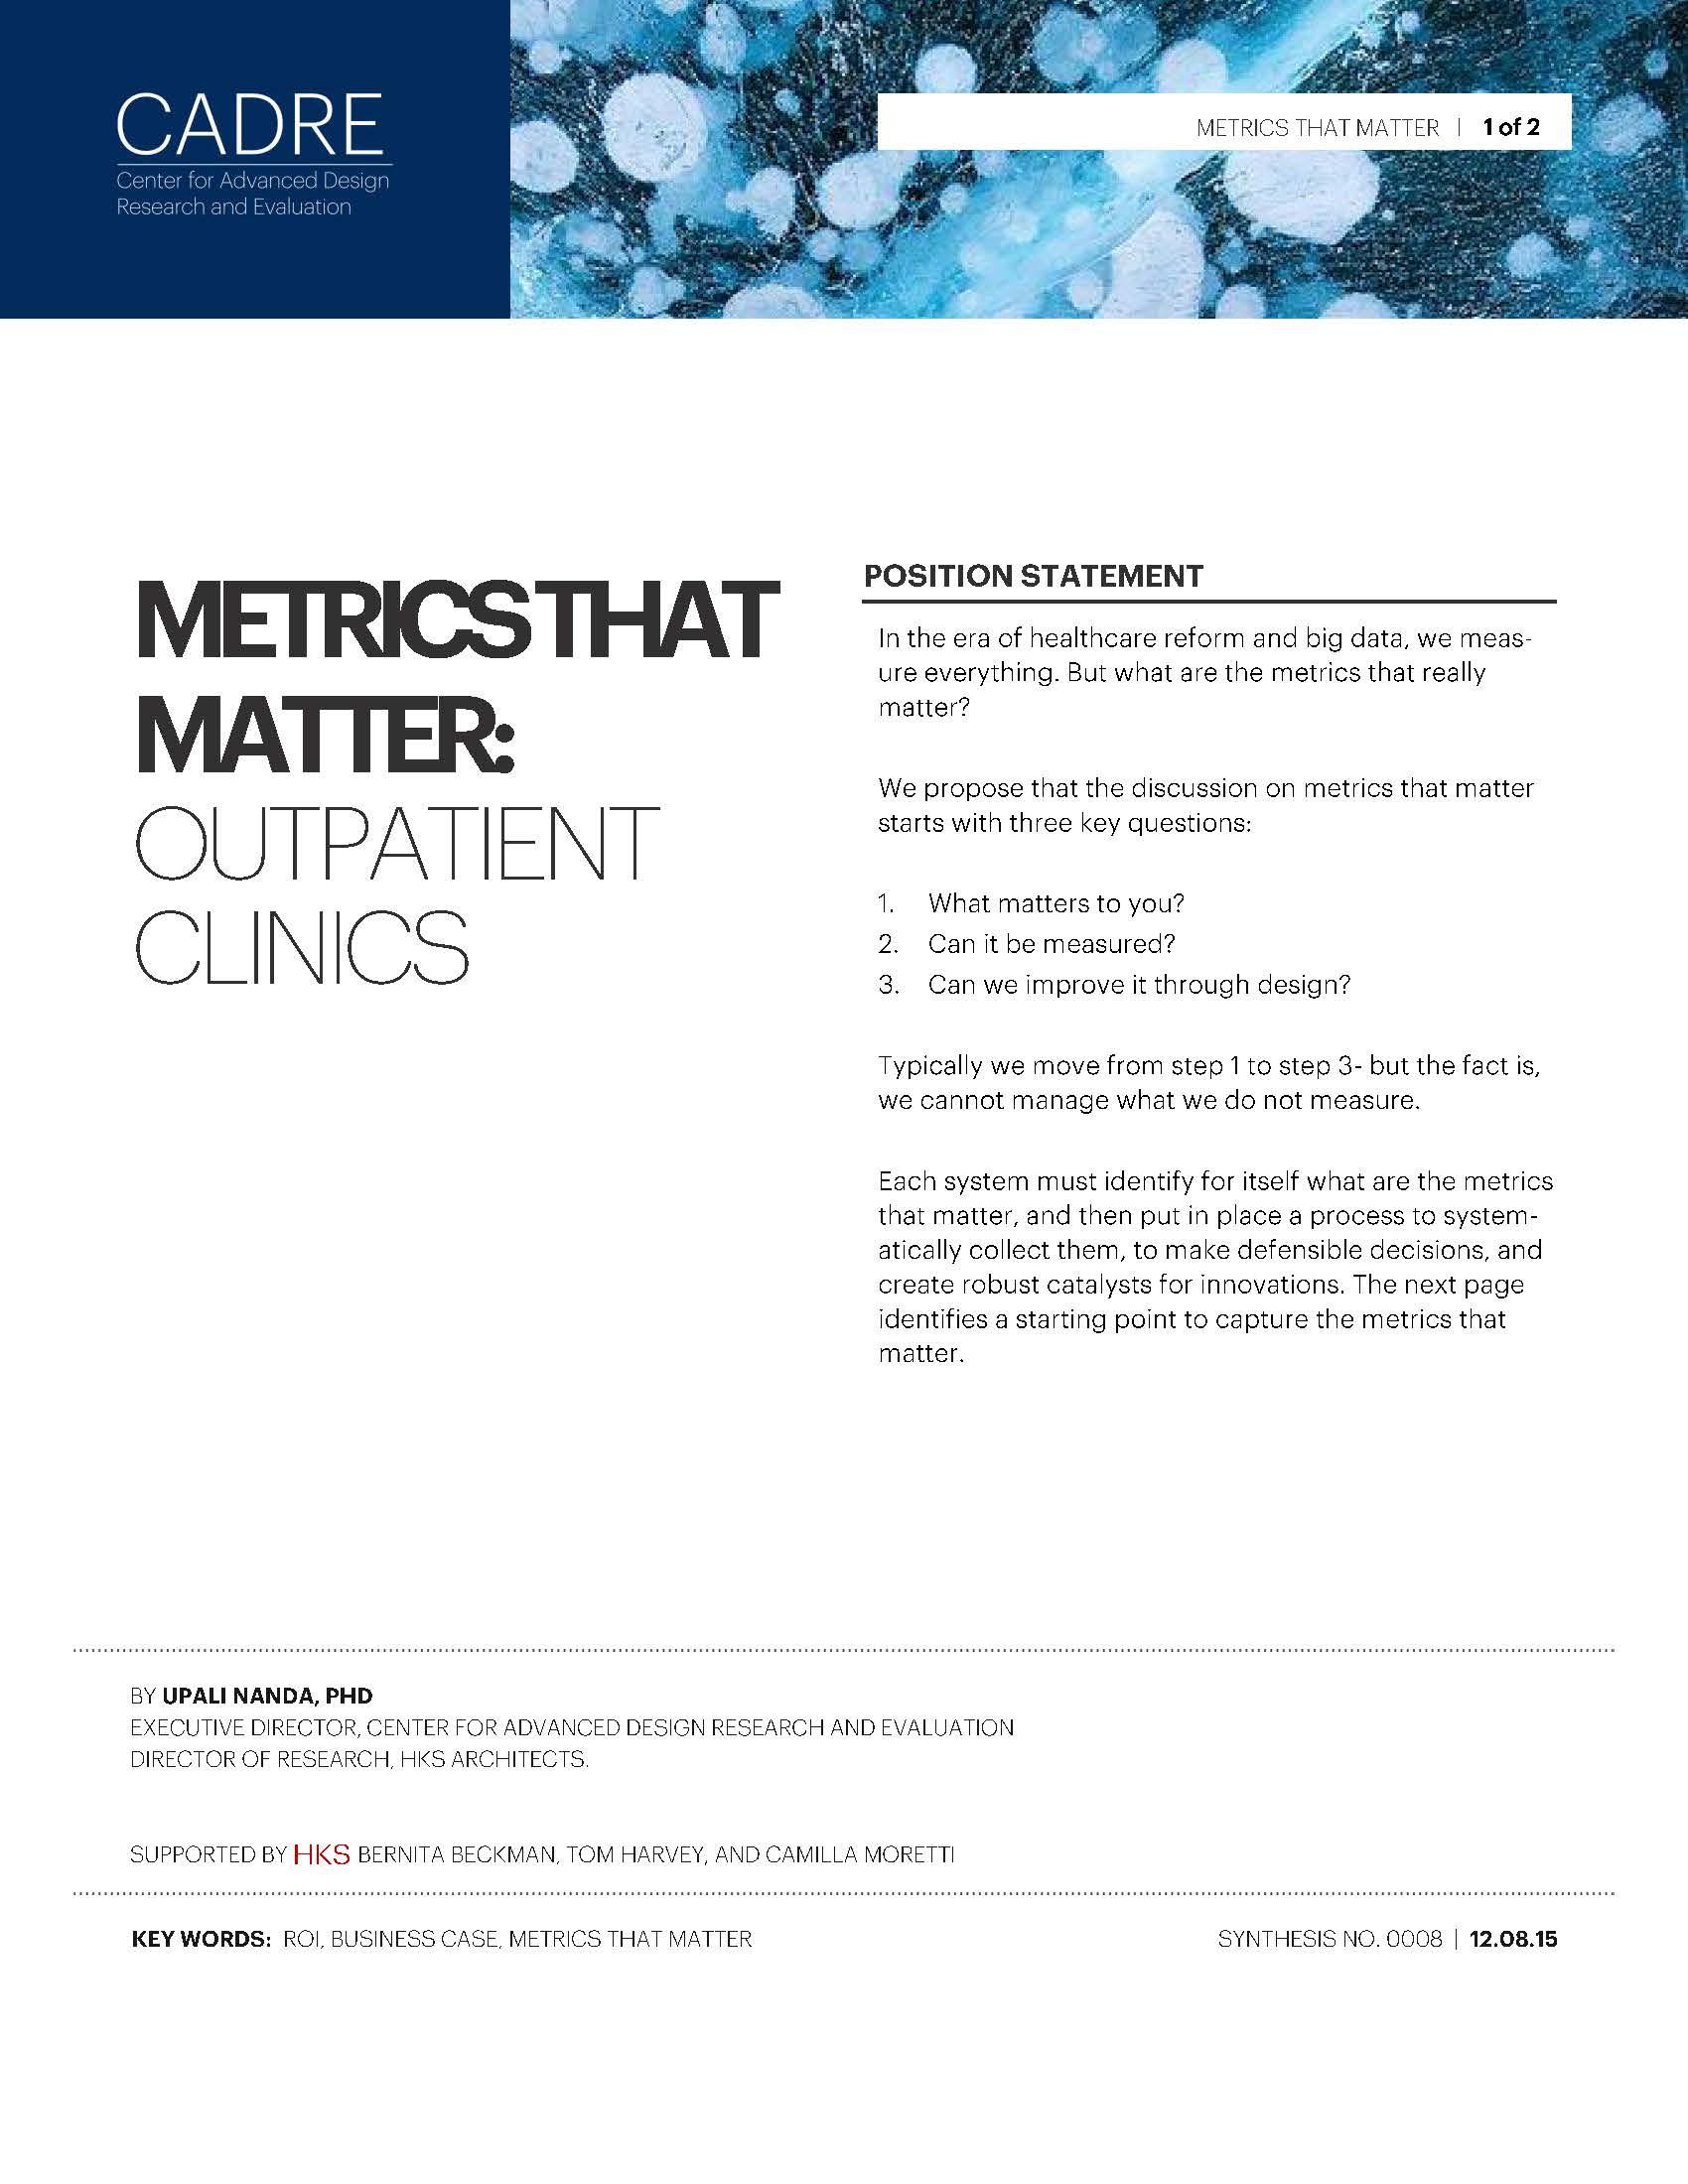 METRICS-THAT-MATTER_synthesis_Page_1.jpg